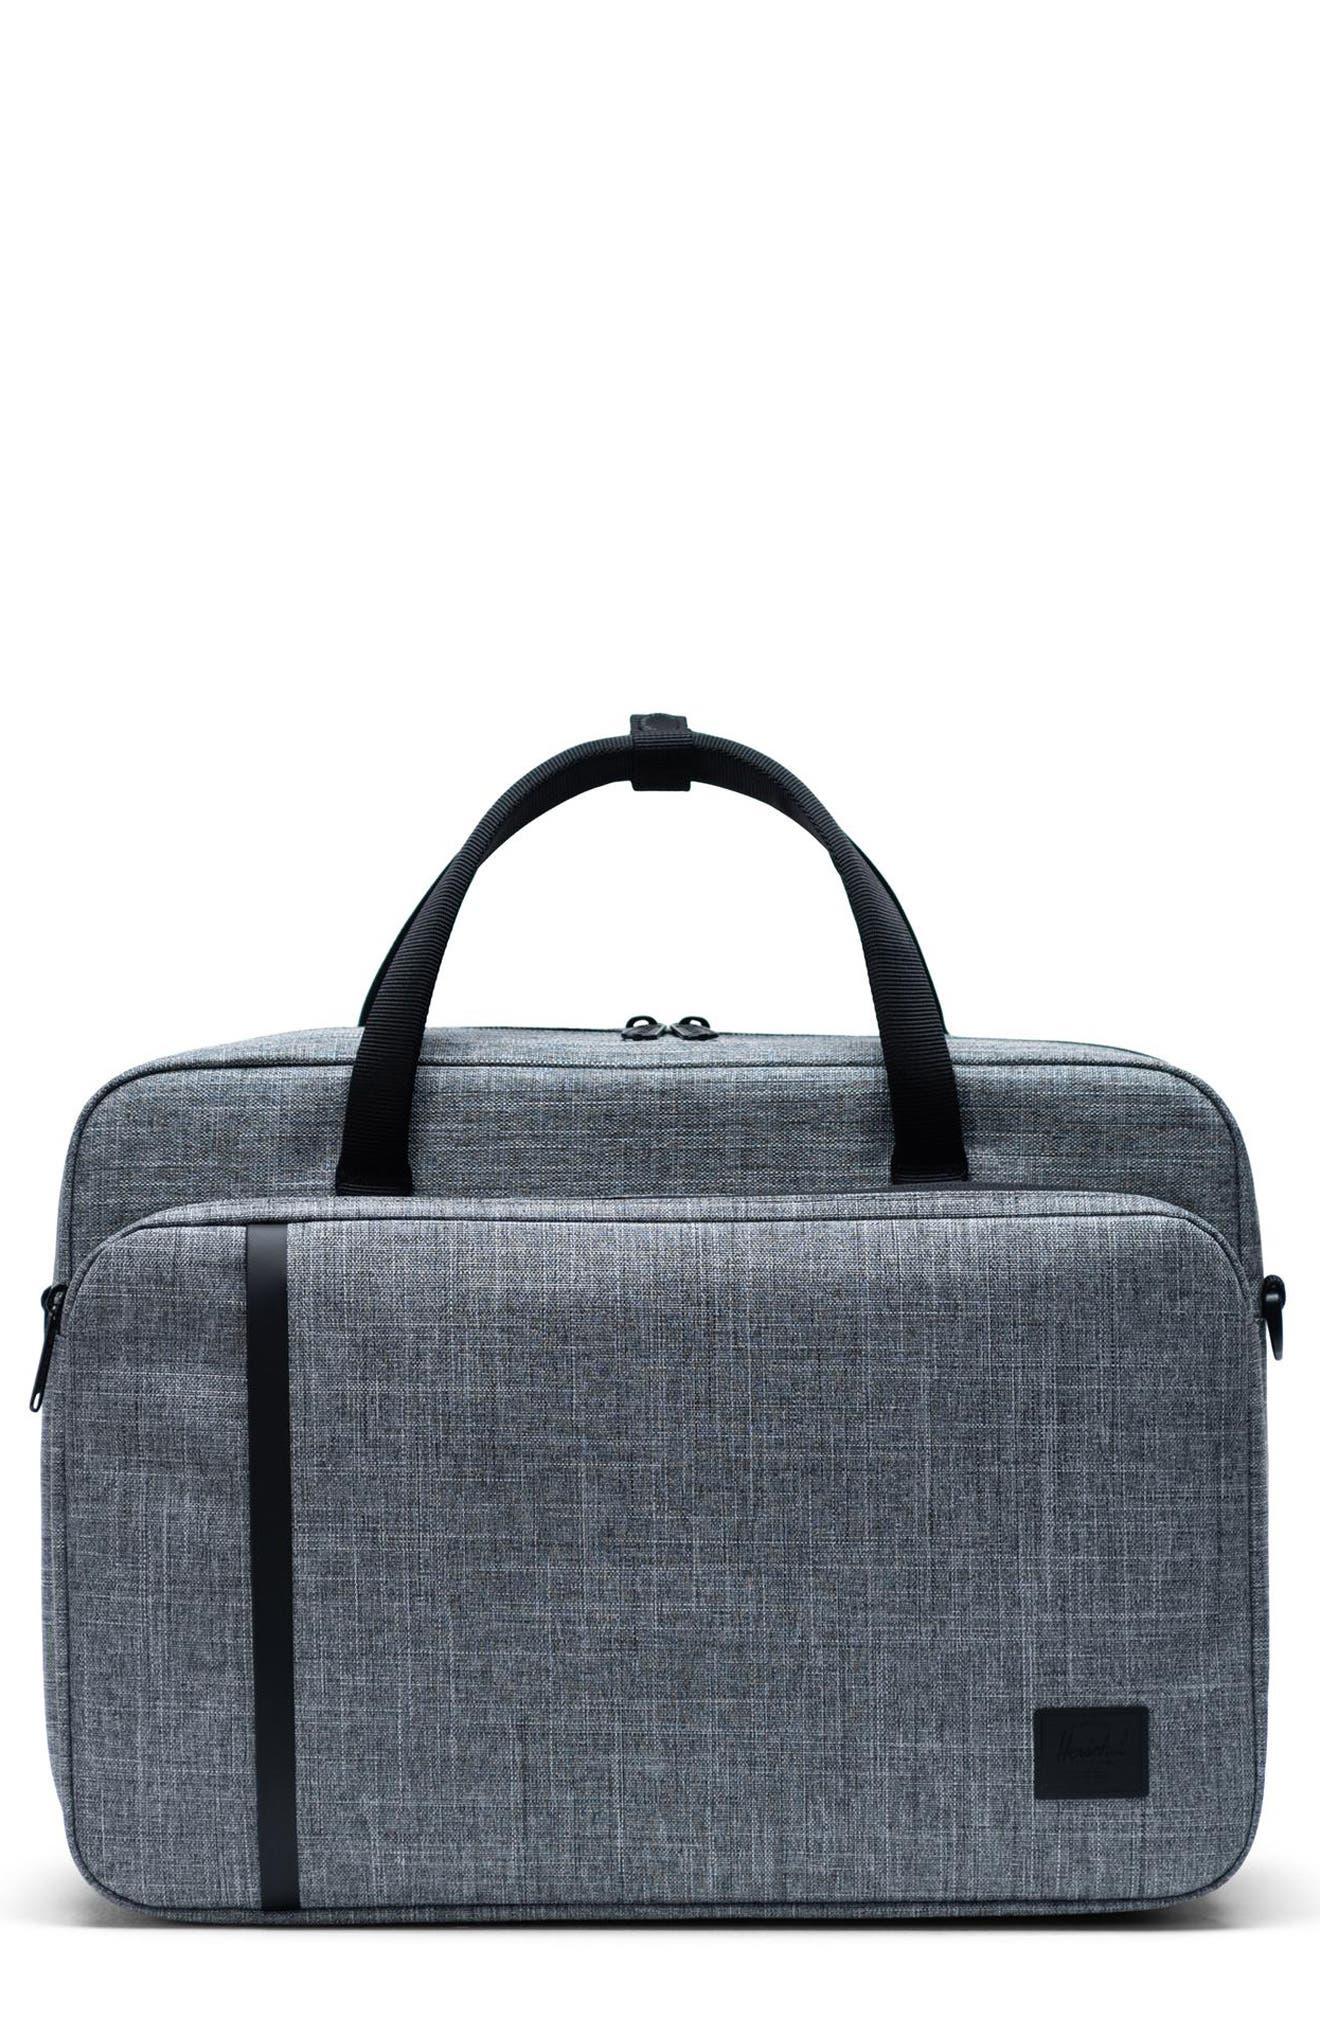 Gibson Travel Briefcase